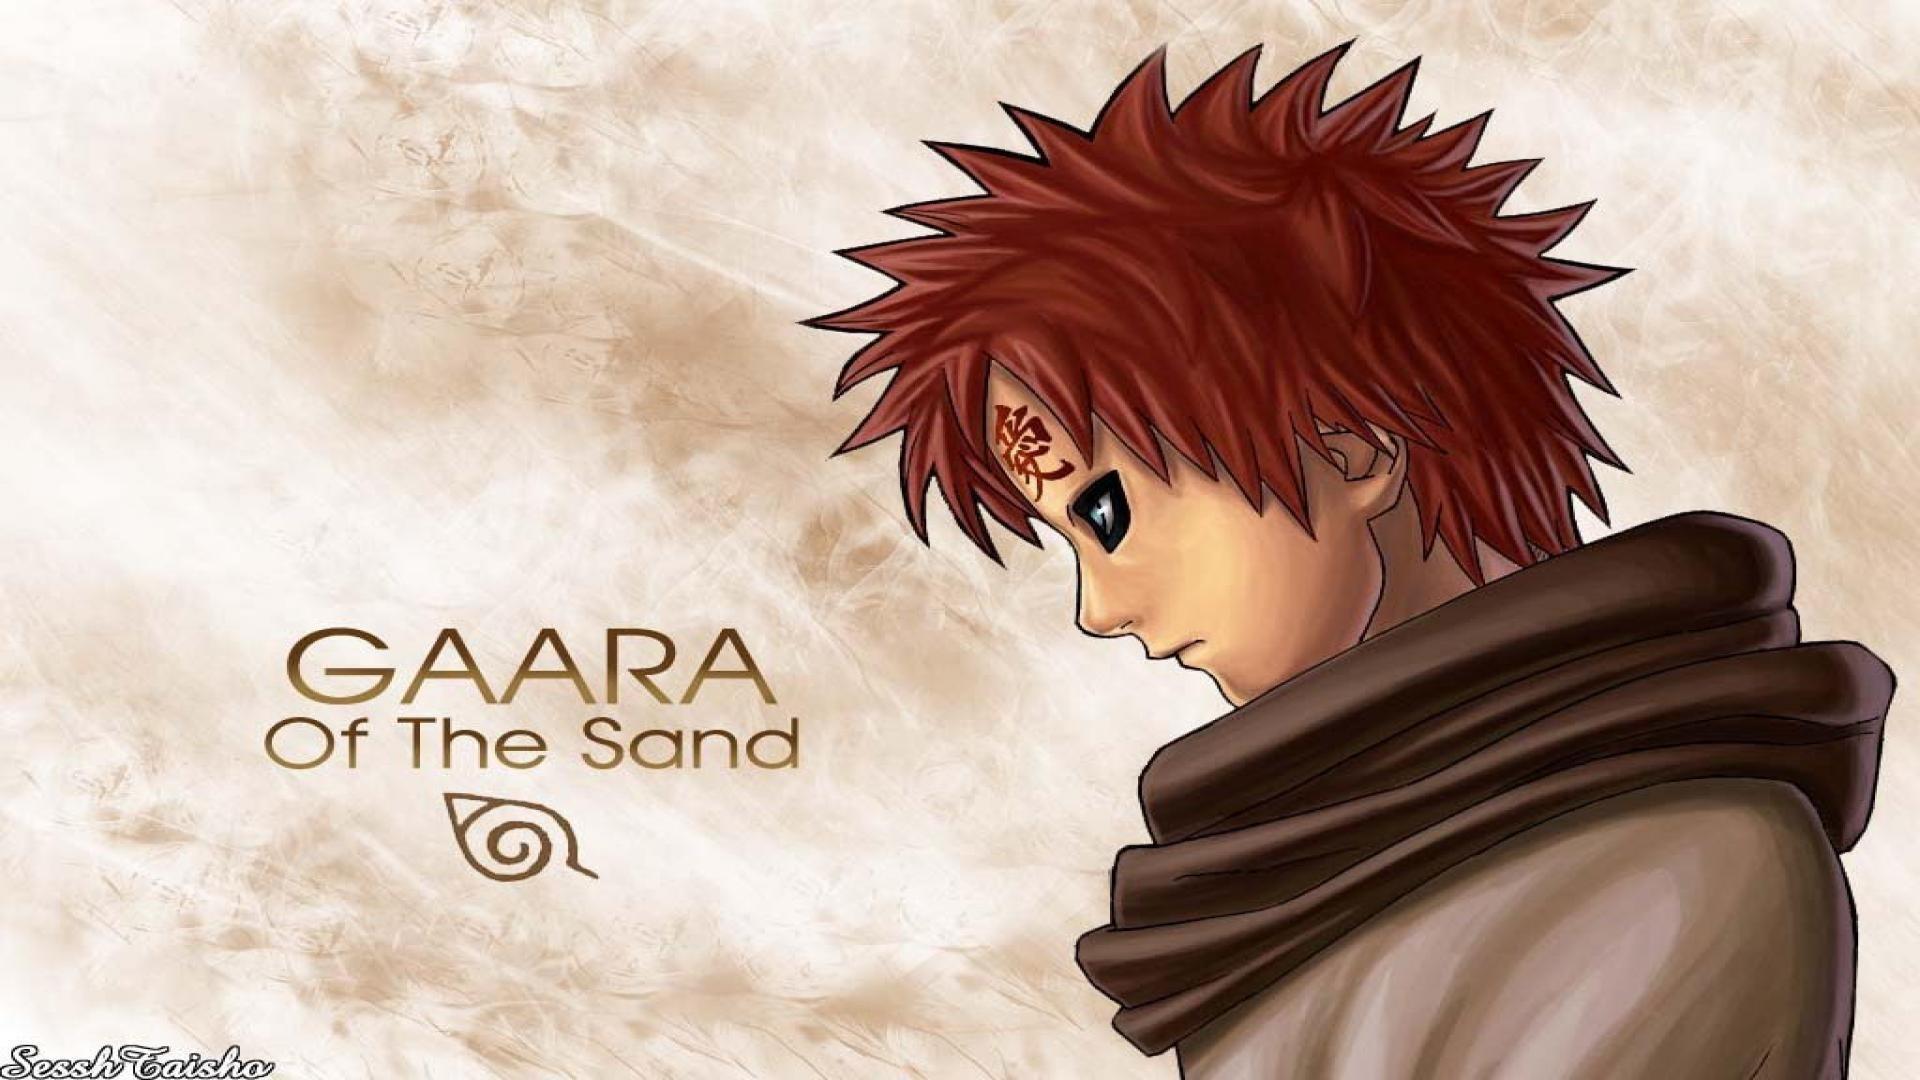 Anime Gaara HD Wallpaper #7900 #3967 Wallpaper   SpotIMG